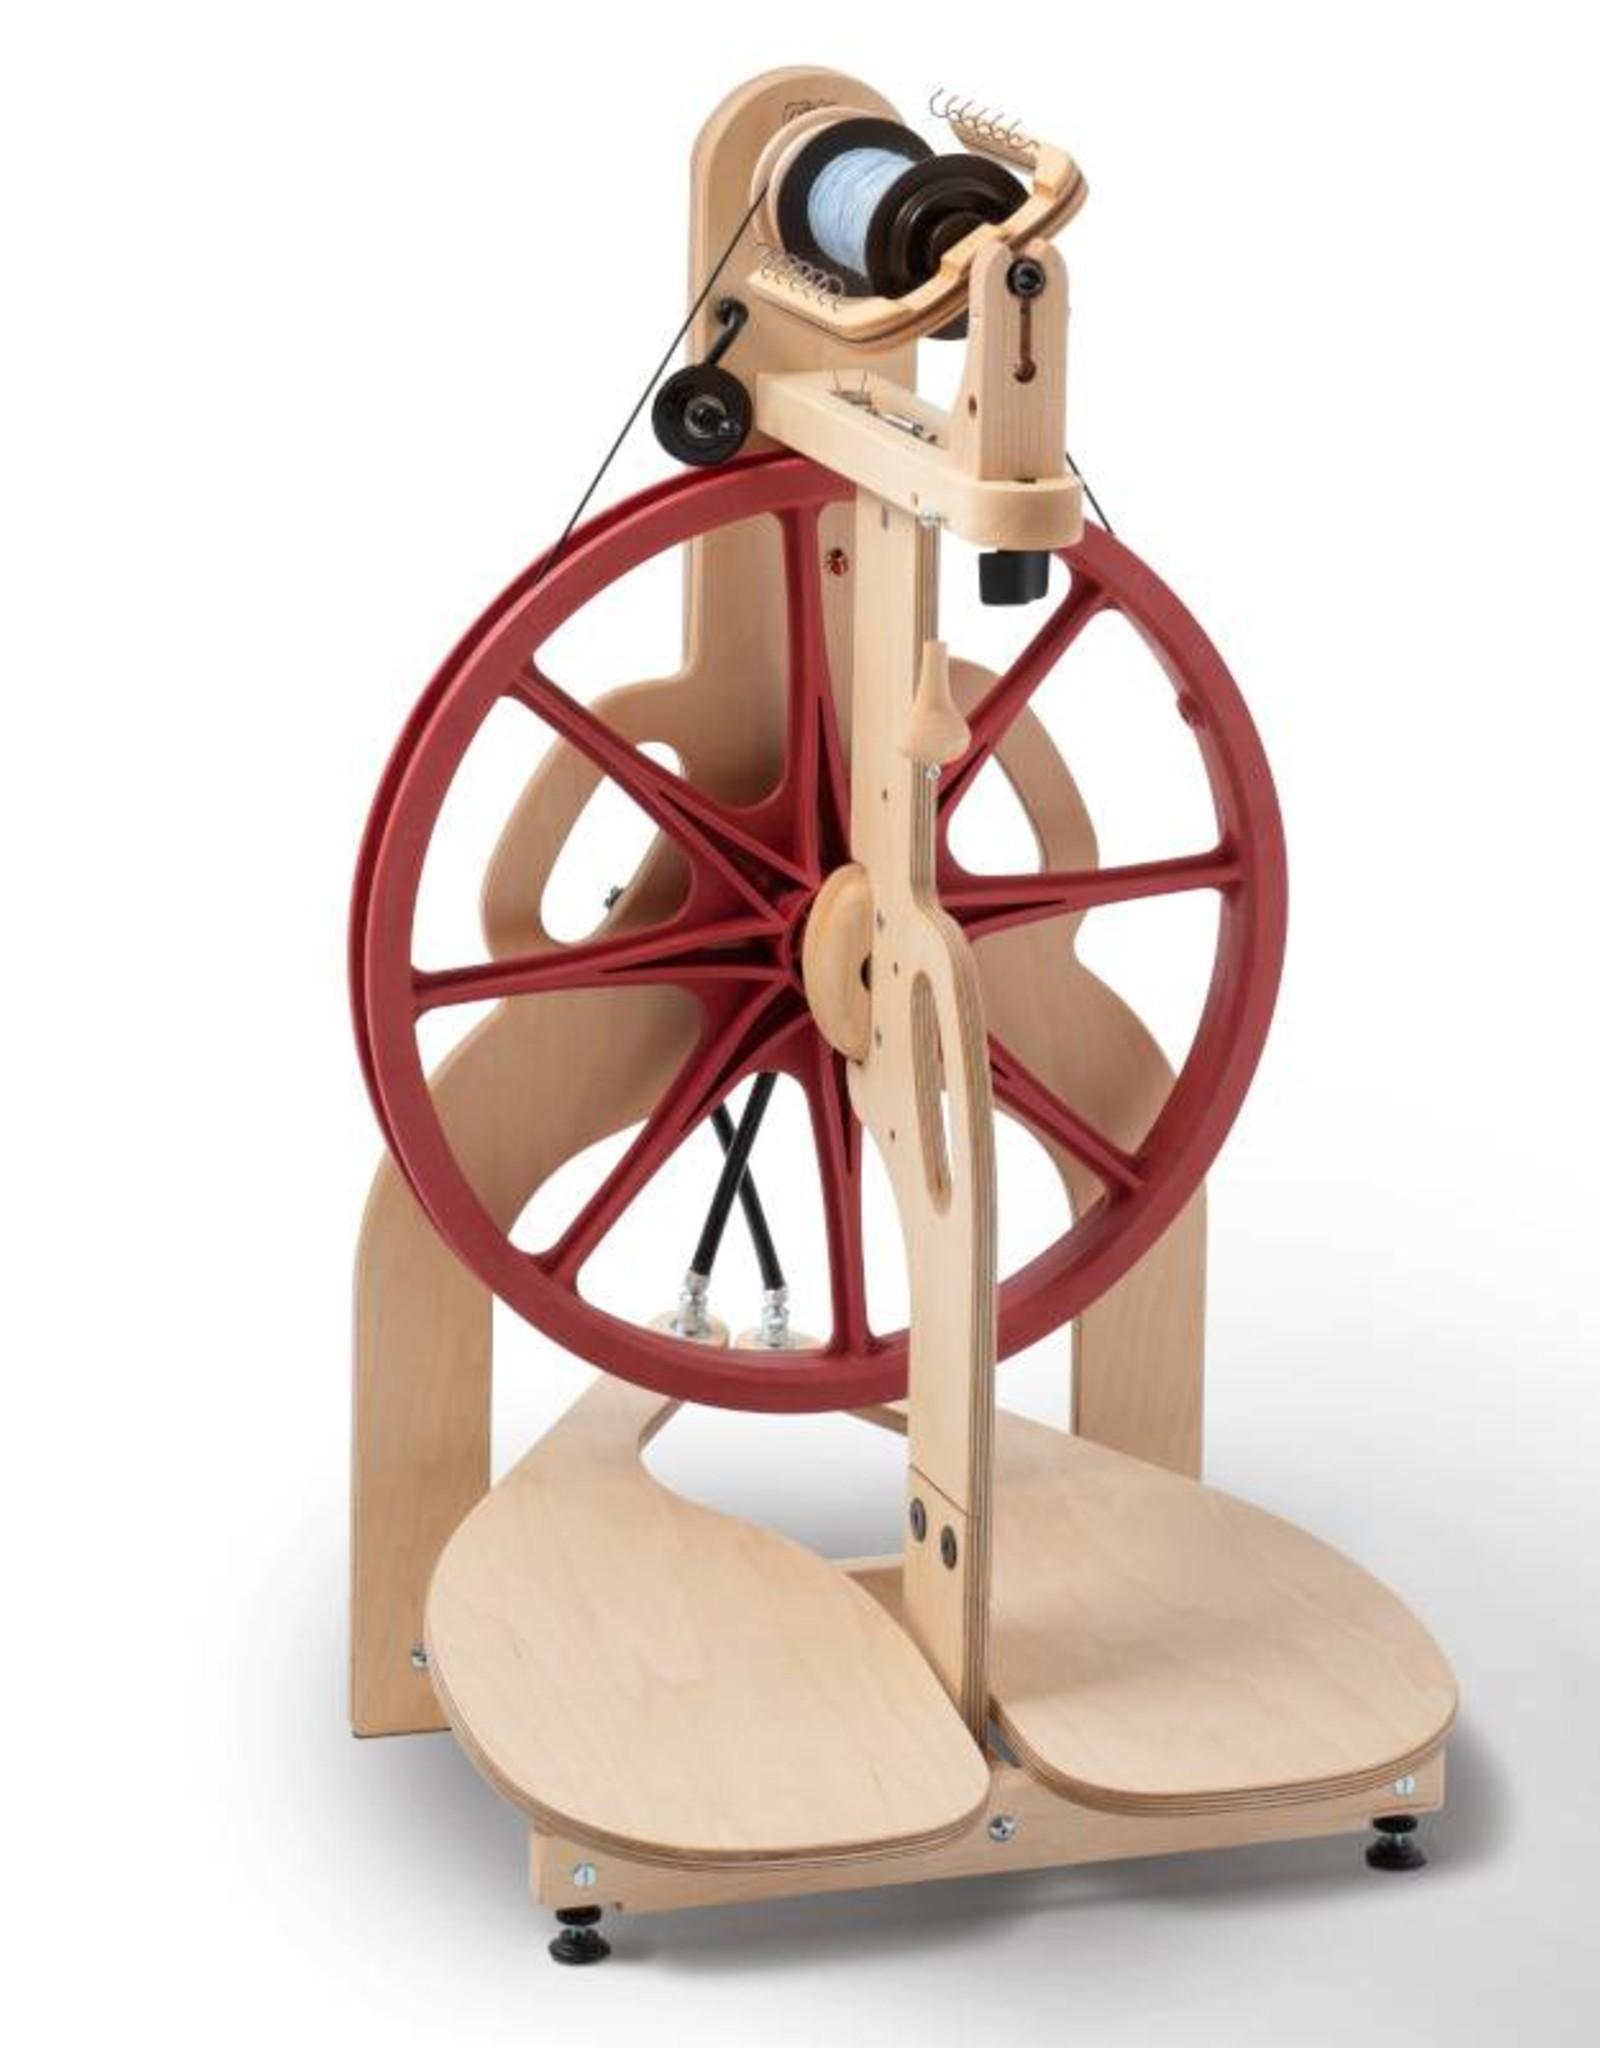 Schacht Ladybug Spinning Wheel